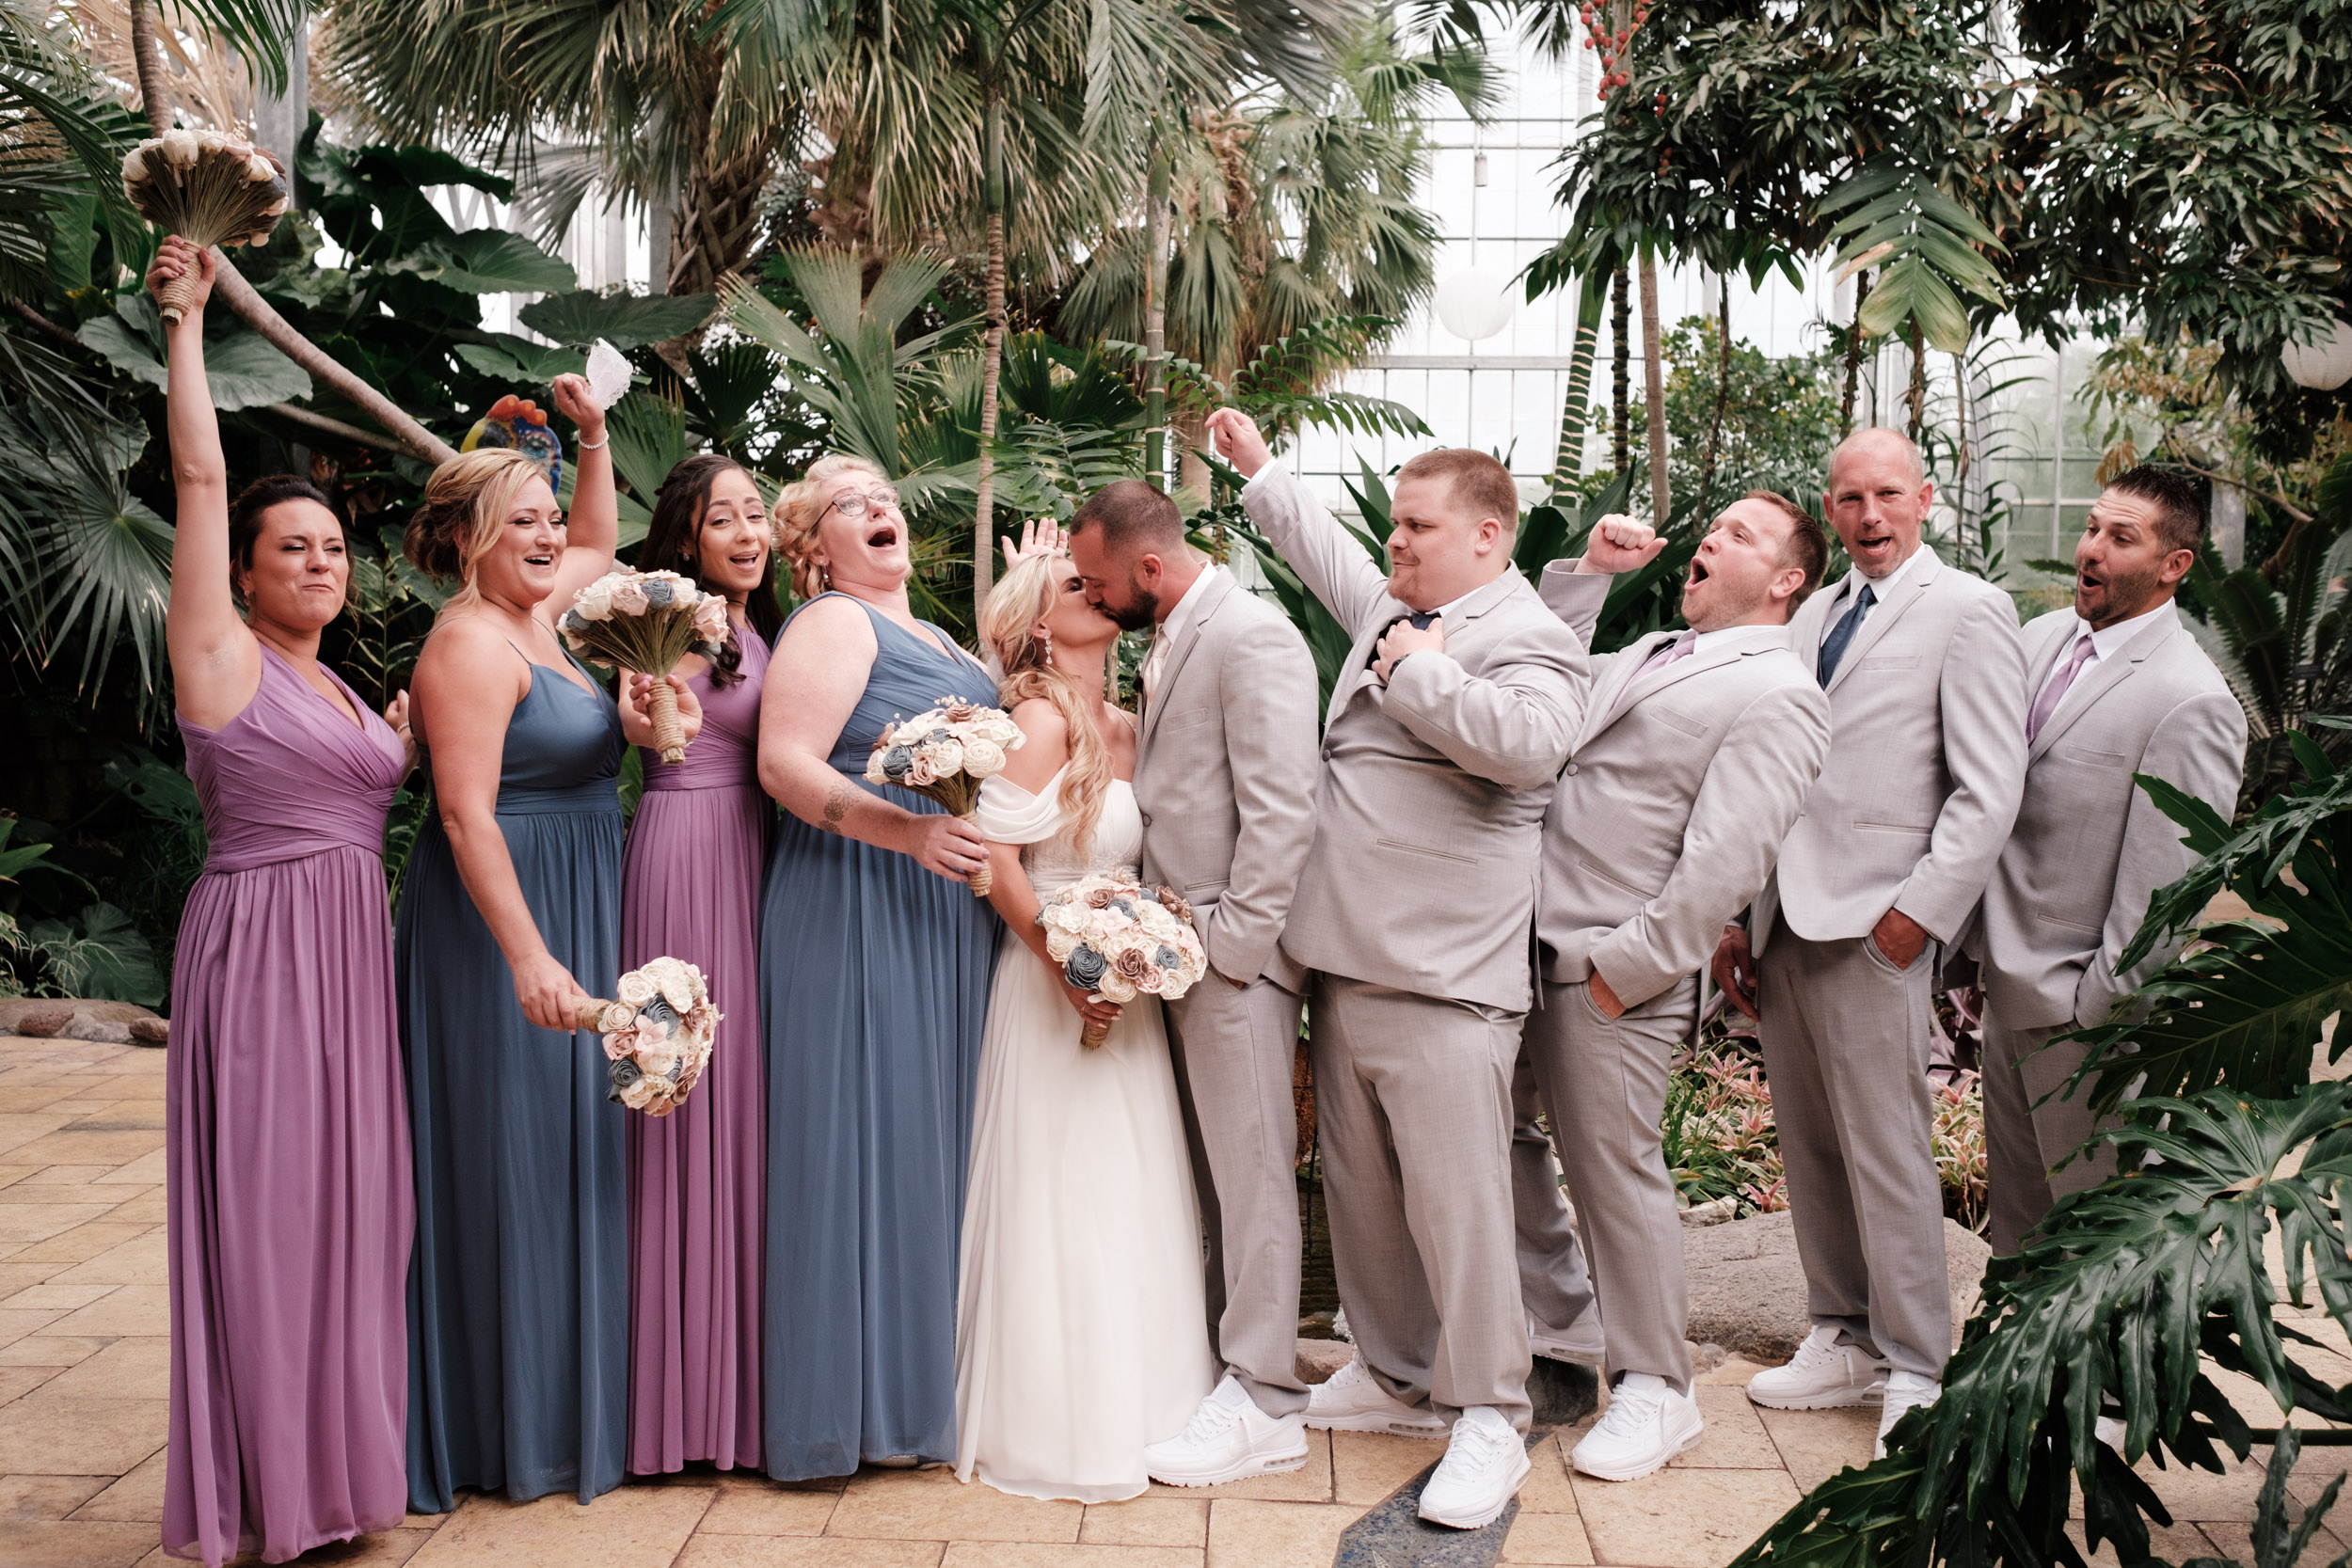 19-06-01 Megan Josh - Nicholas Conservatory Wedding-25.jpg